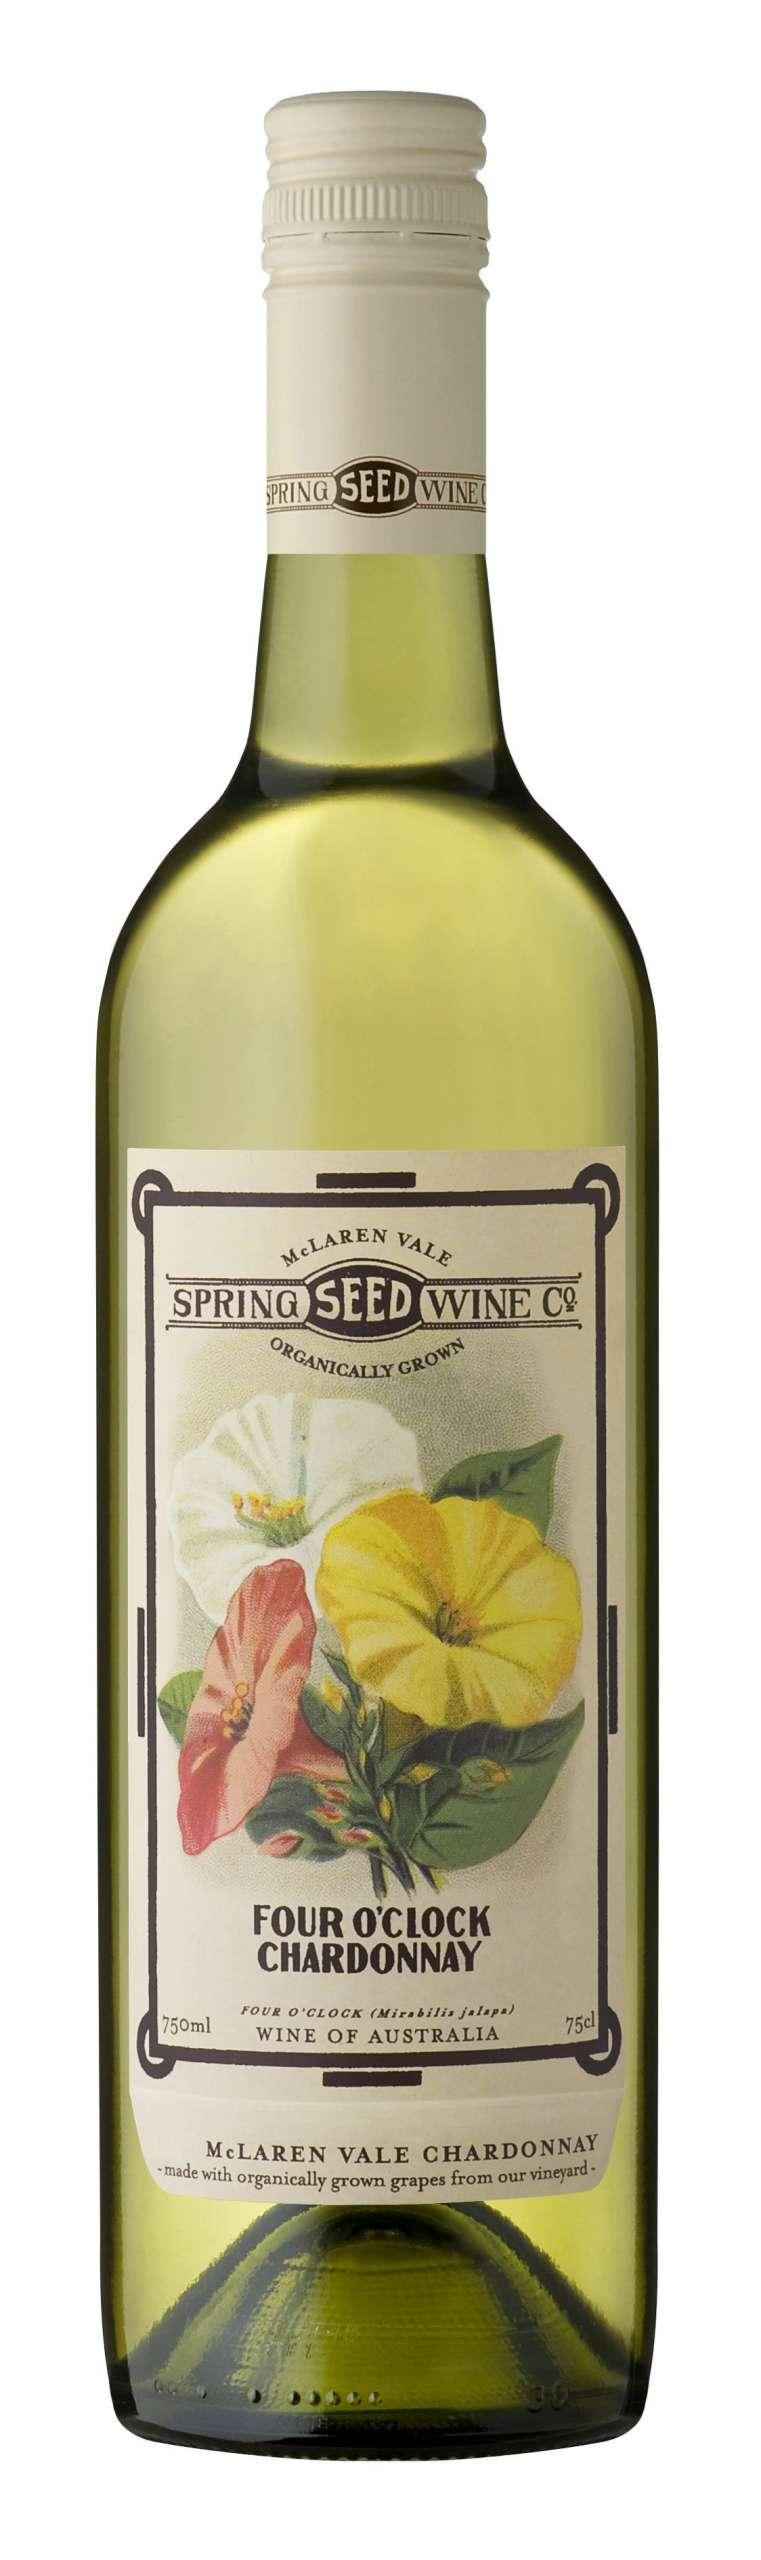 Spring Seed Wine Company 'Four O'Clock' Chardonnay 2018 (Organic)-0